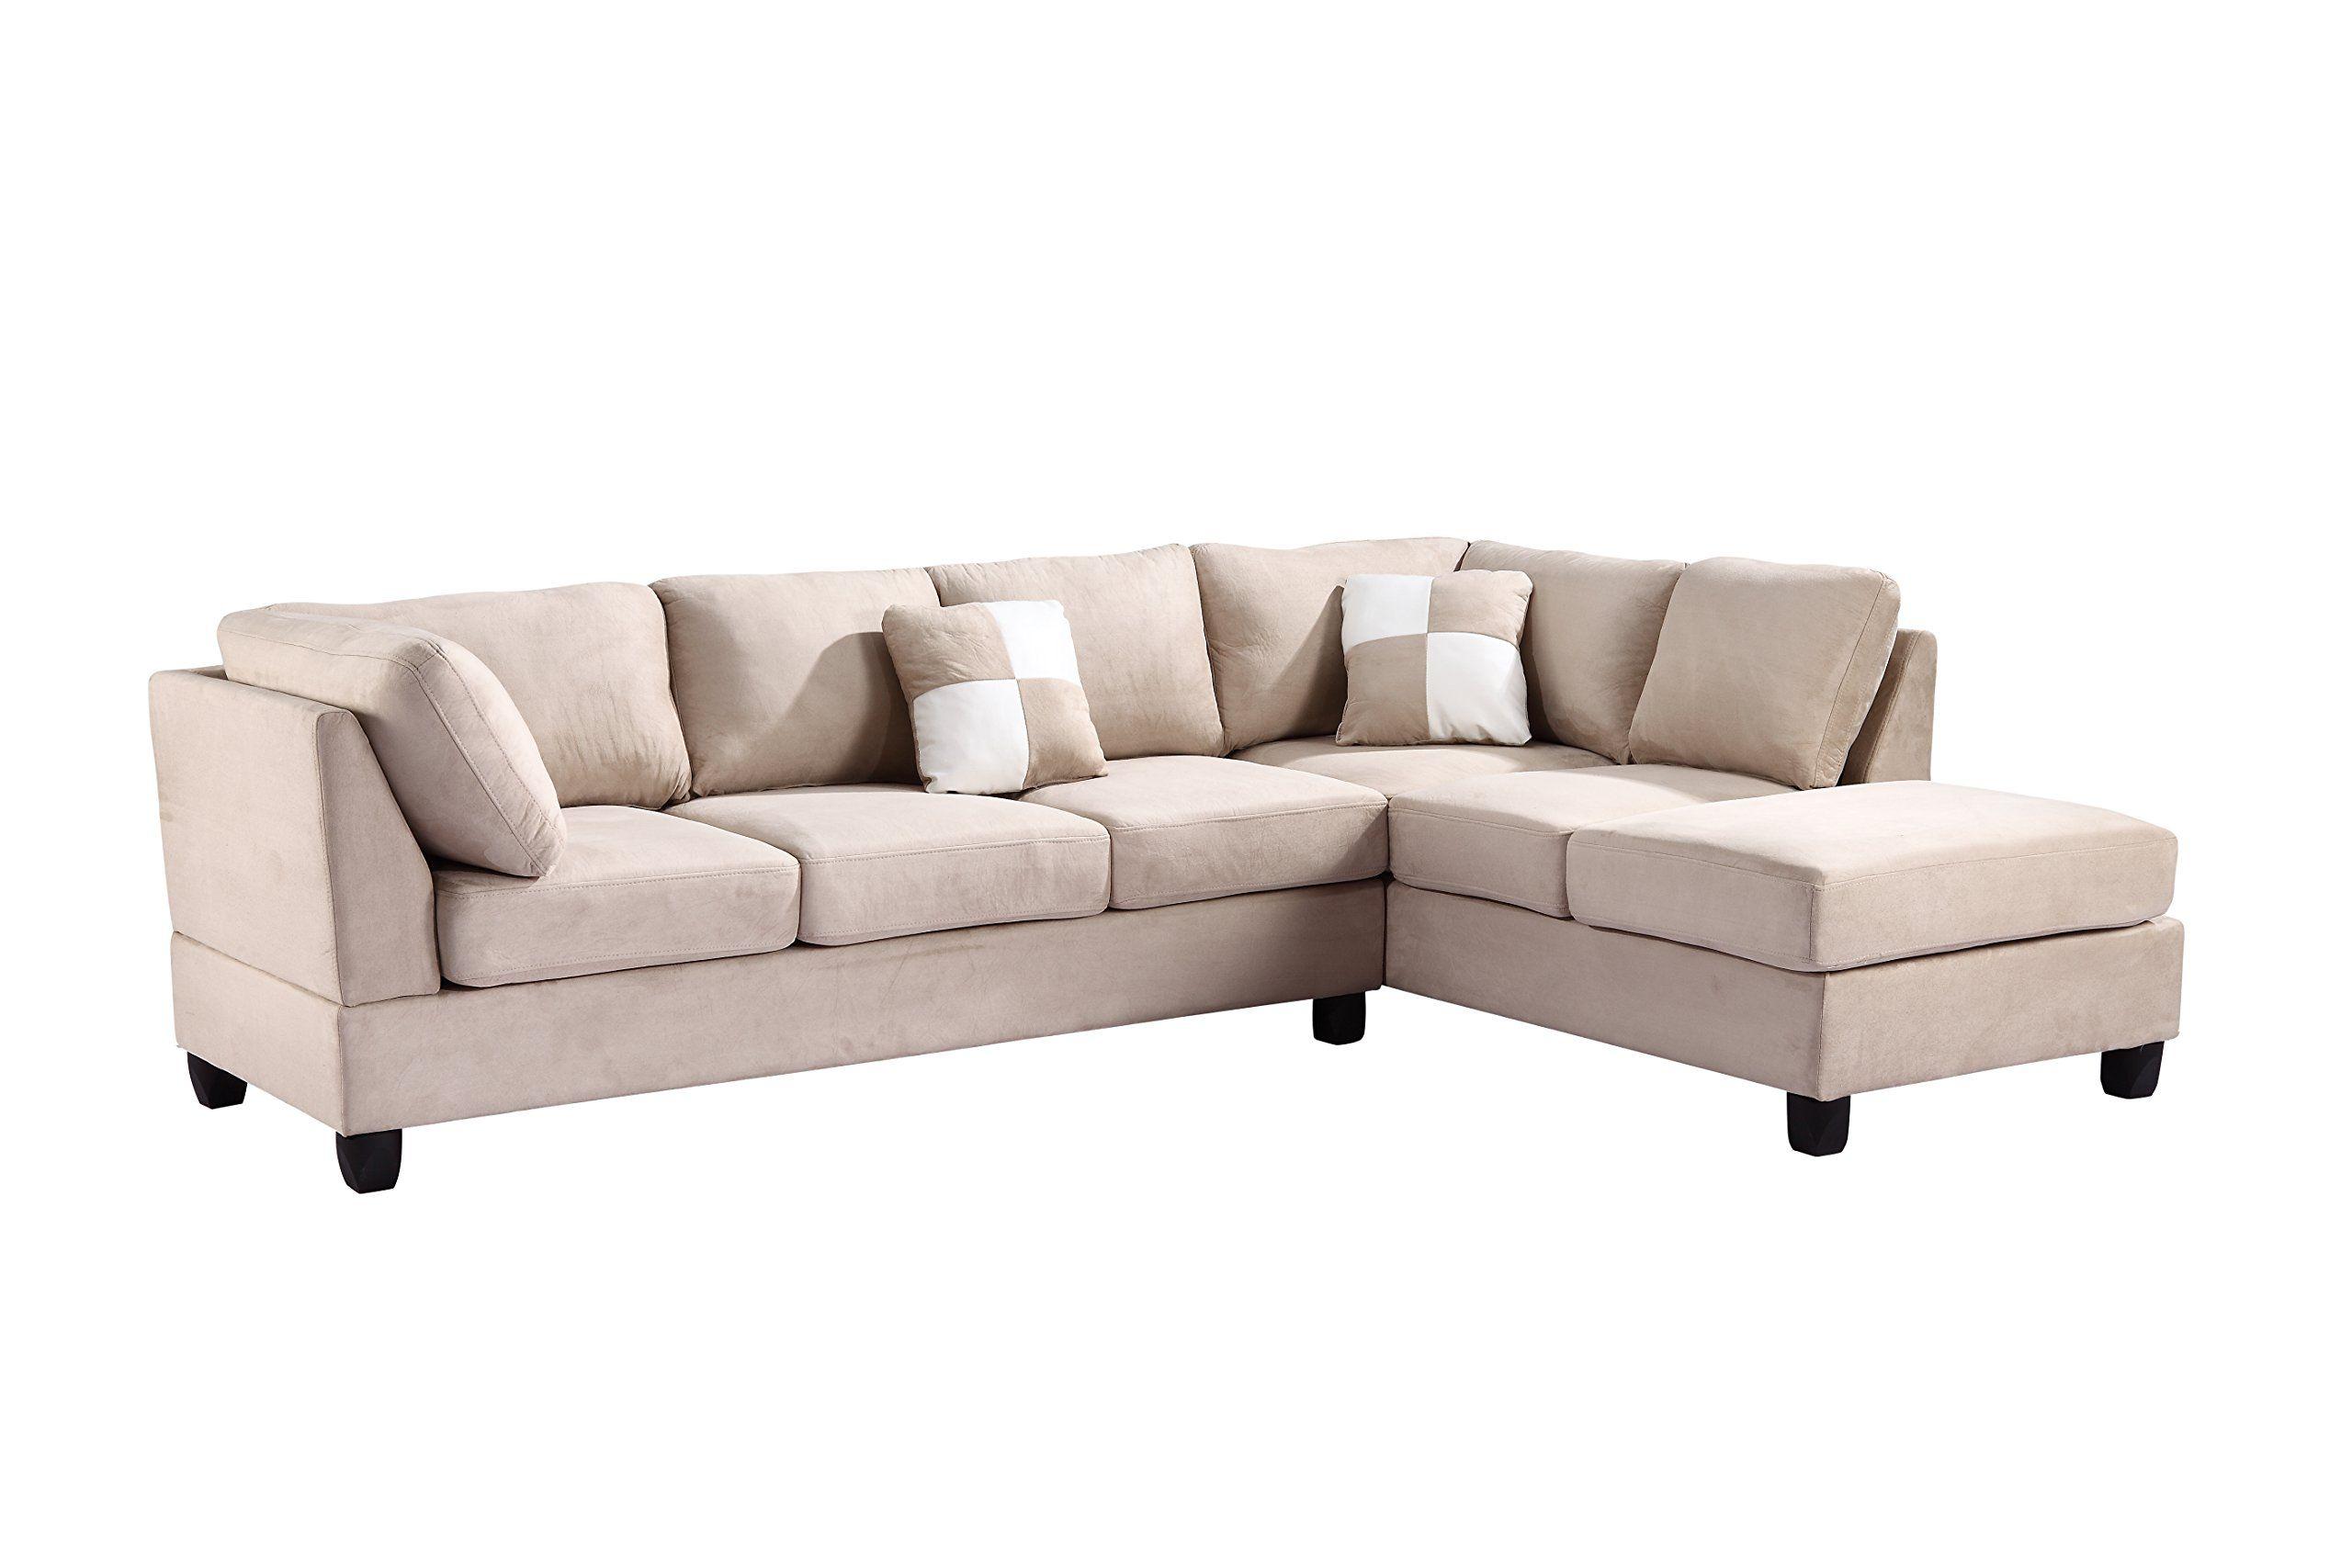 Amazon Com Glory Furniture G631 Sc Sectional Sofa Beige 2